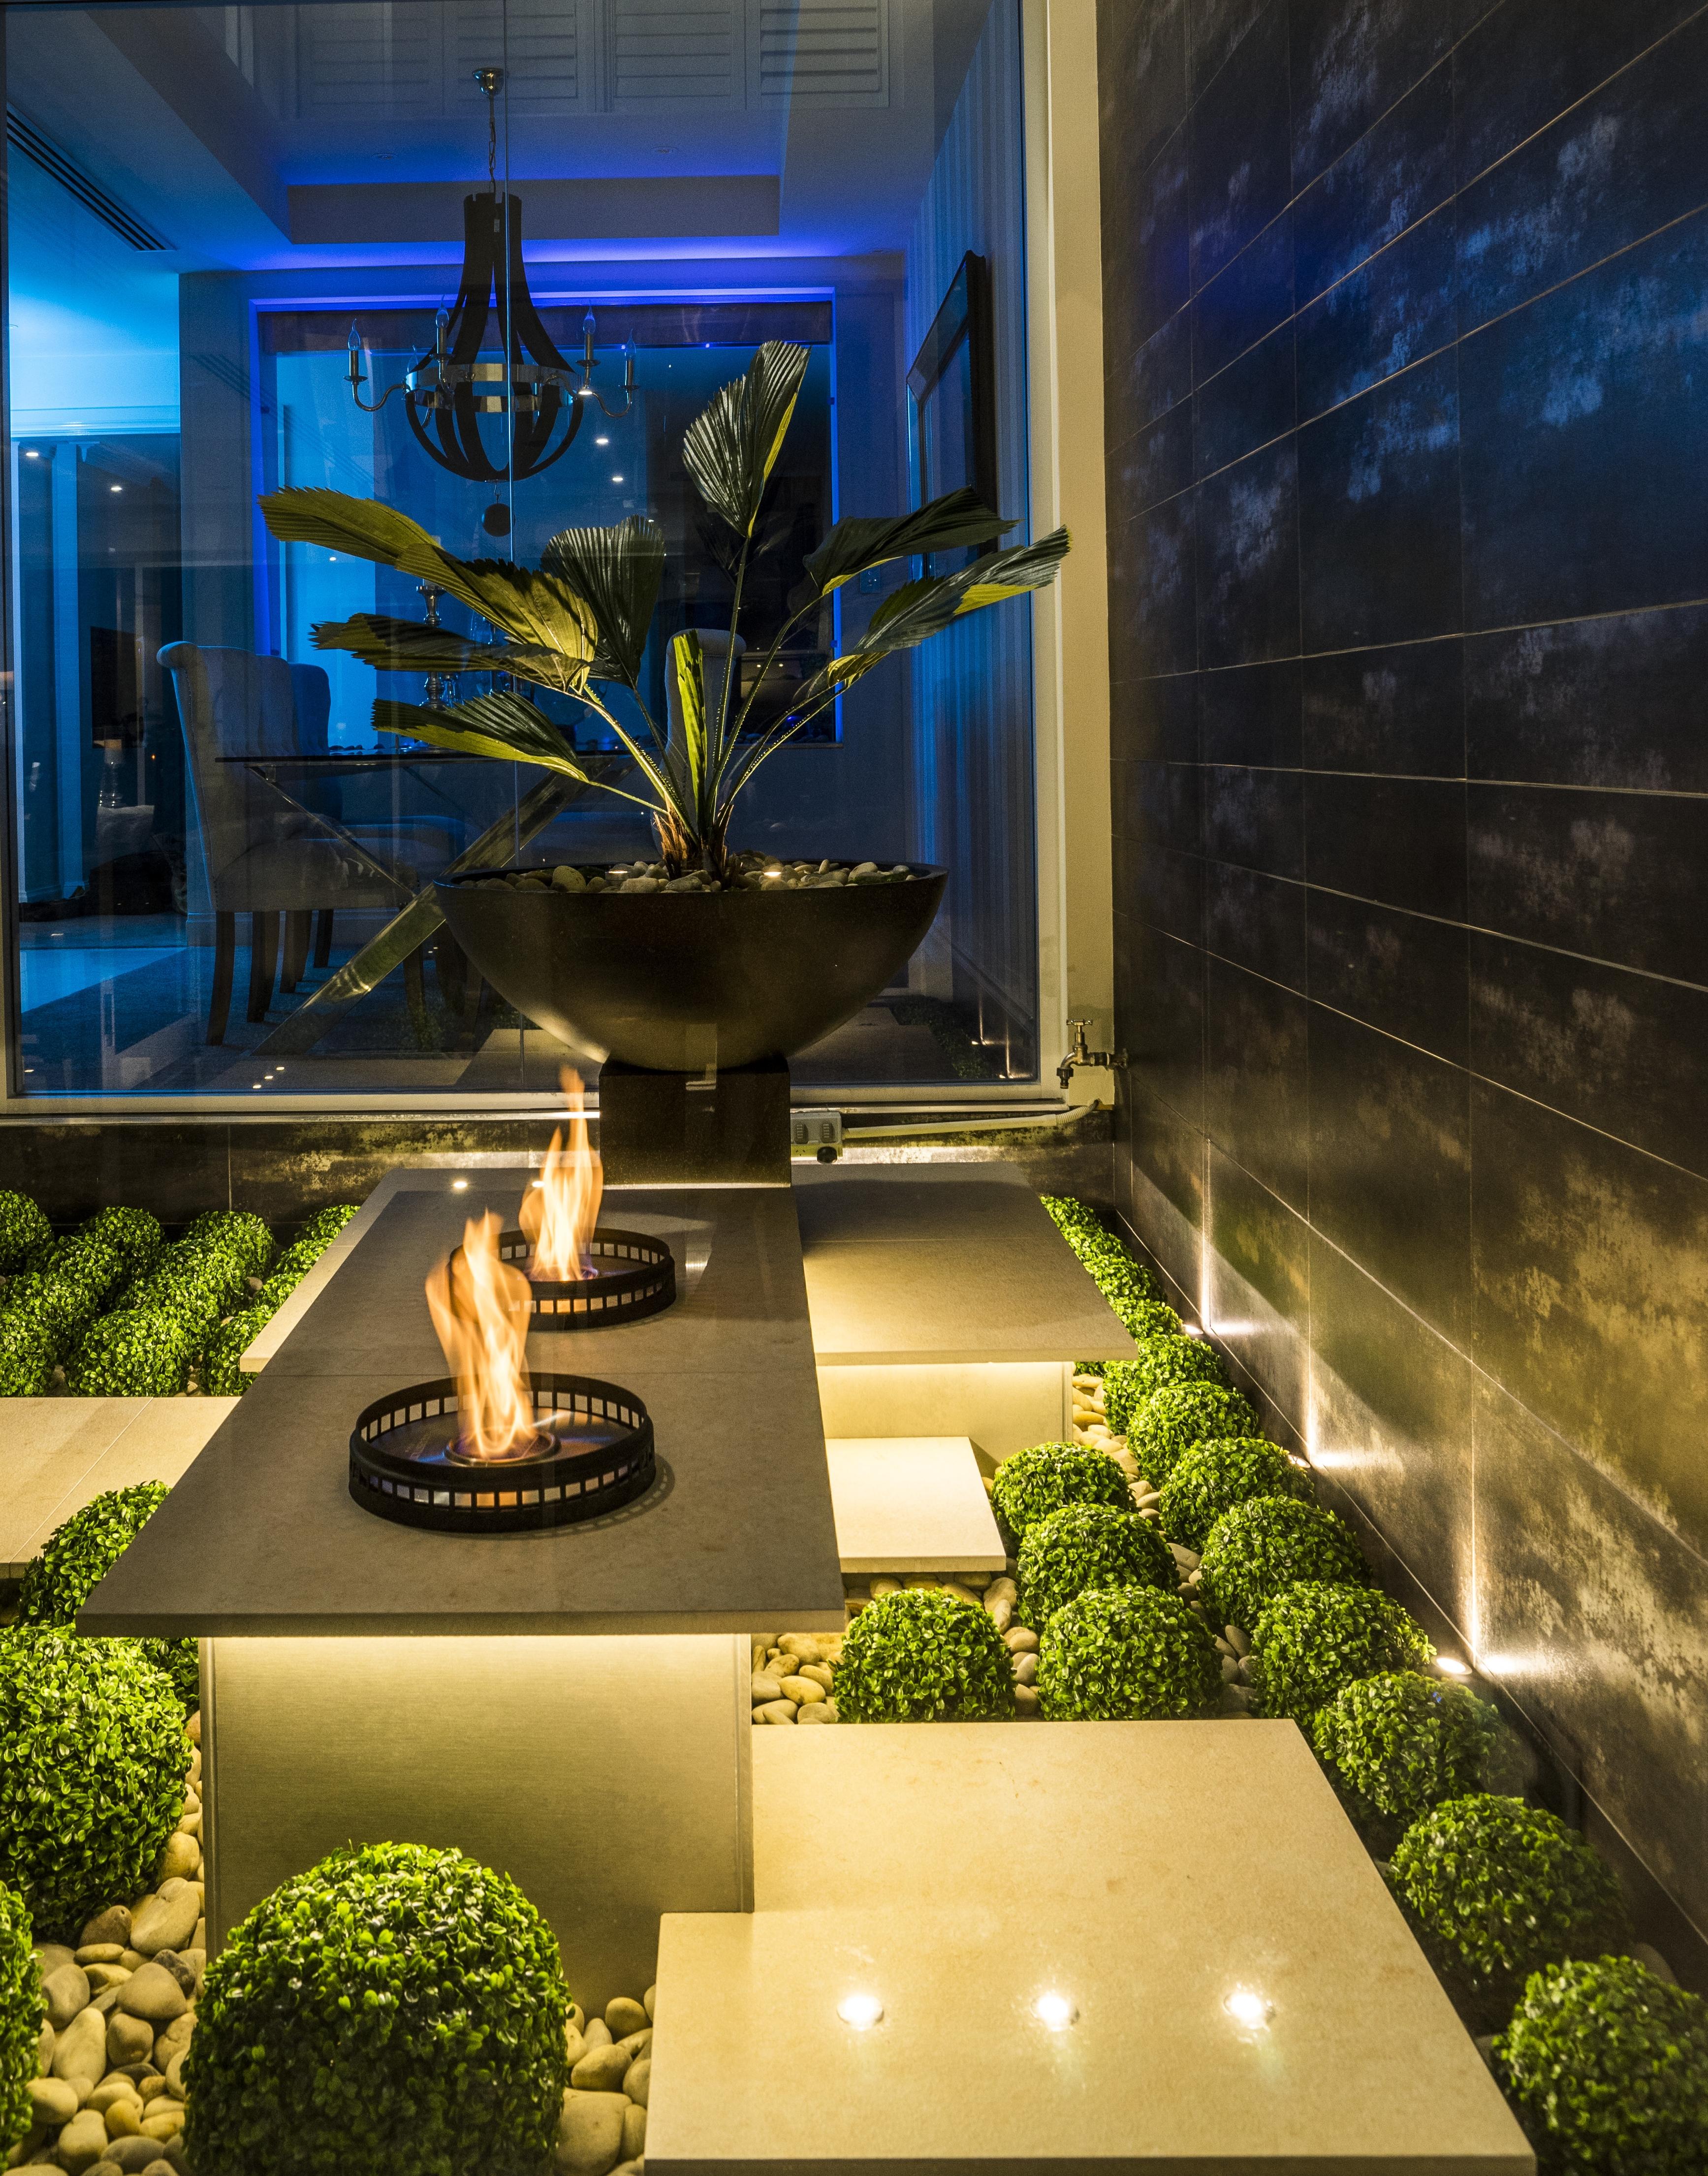 Award Winning Landscape Design Adelaide Agatha Ozhylovski 3